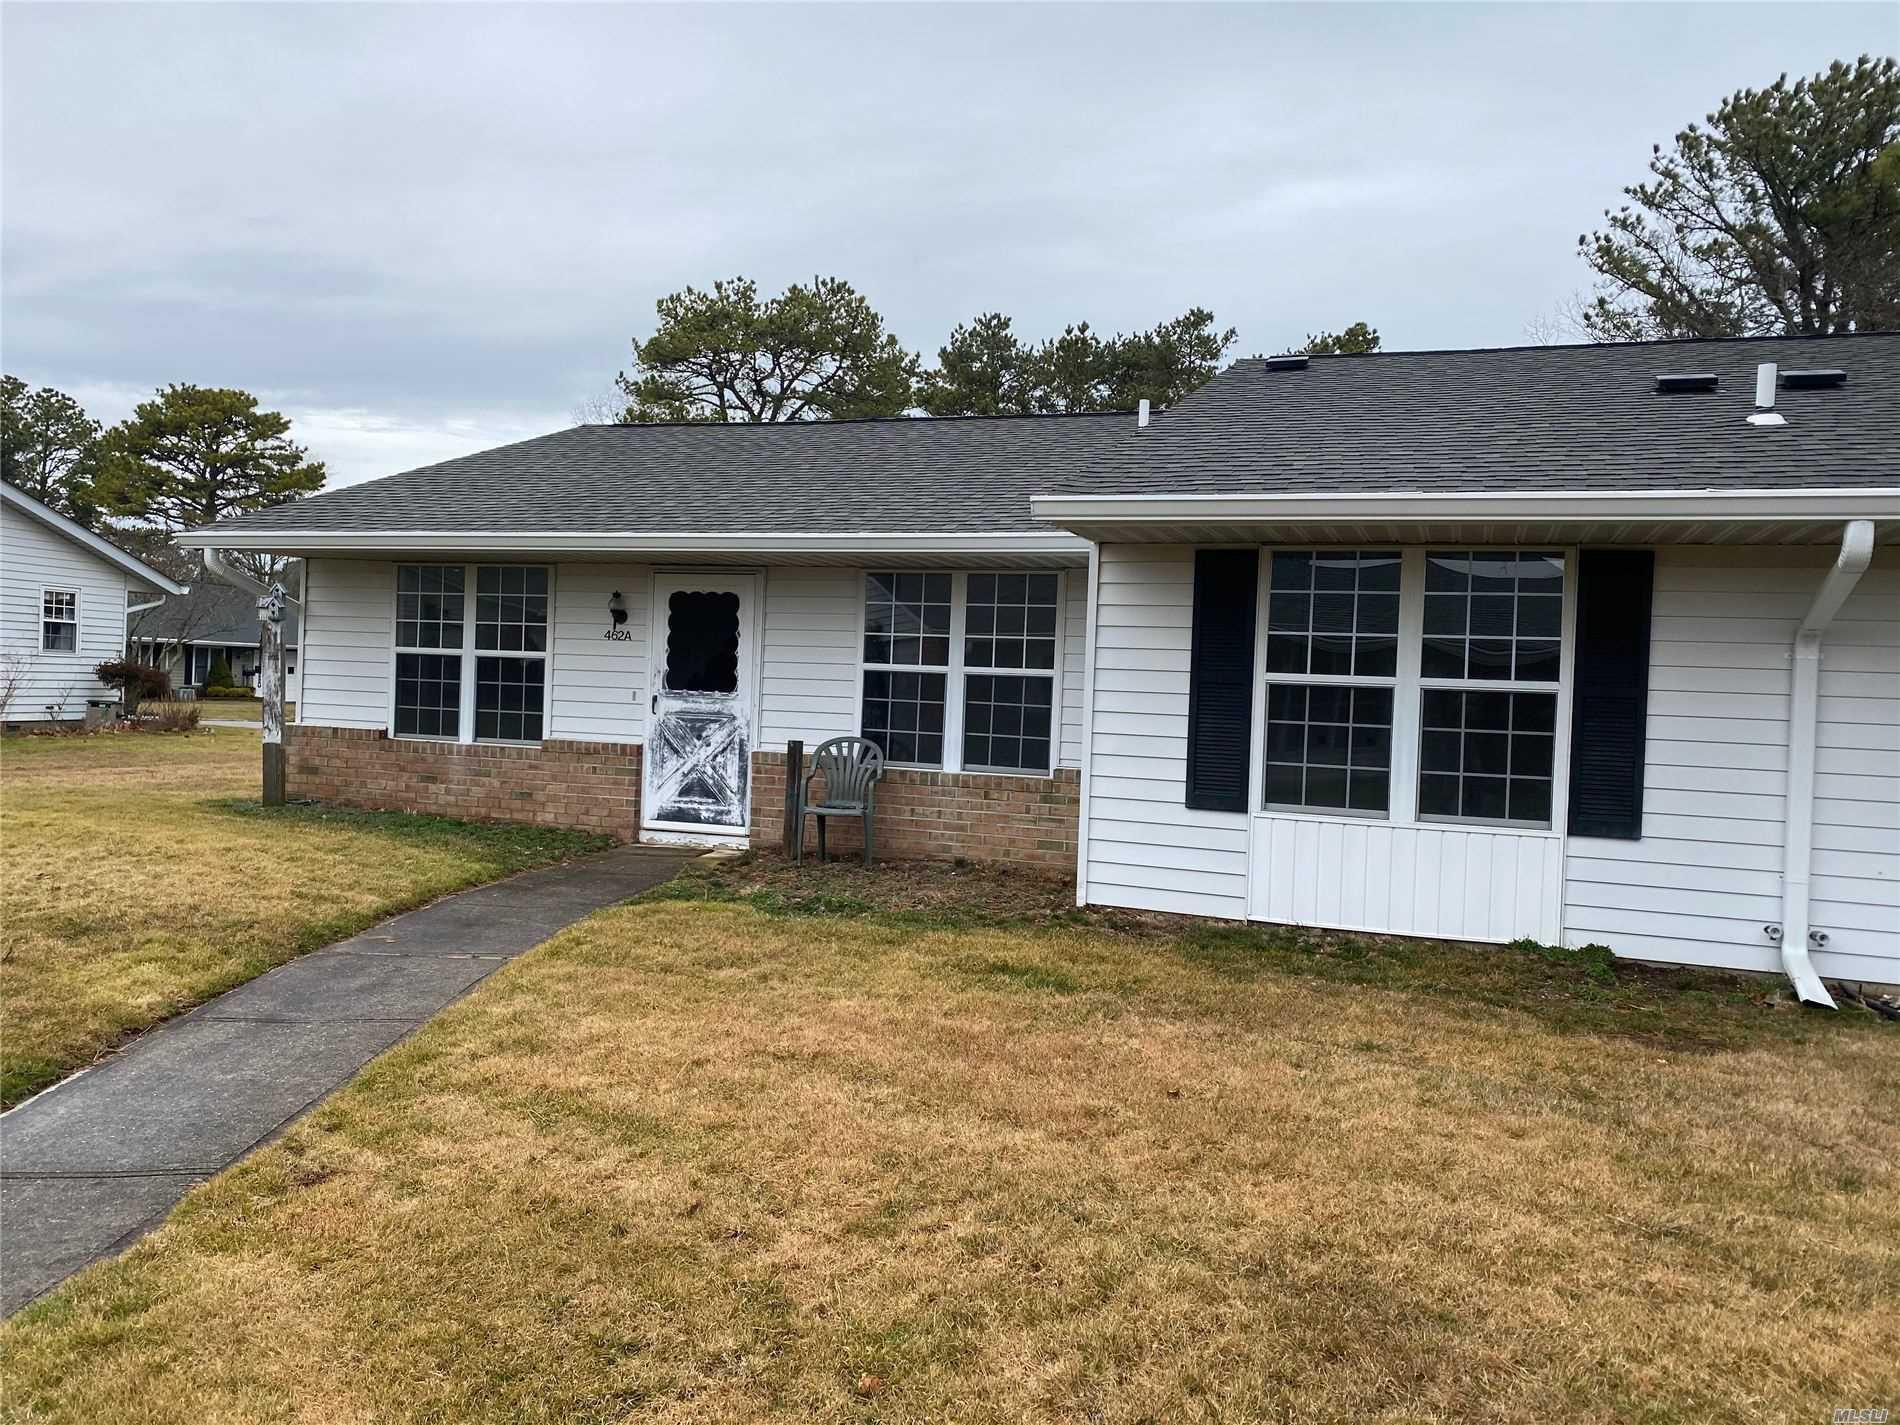 Property for sale at 462 Oldham Court, Ridge NY 11961, Ridge,  New York 11961